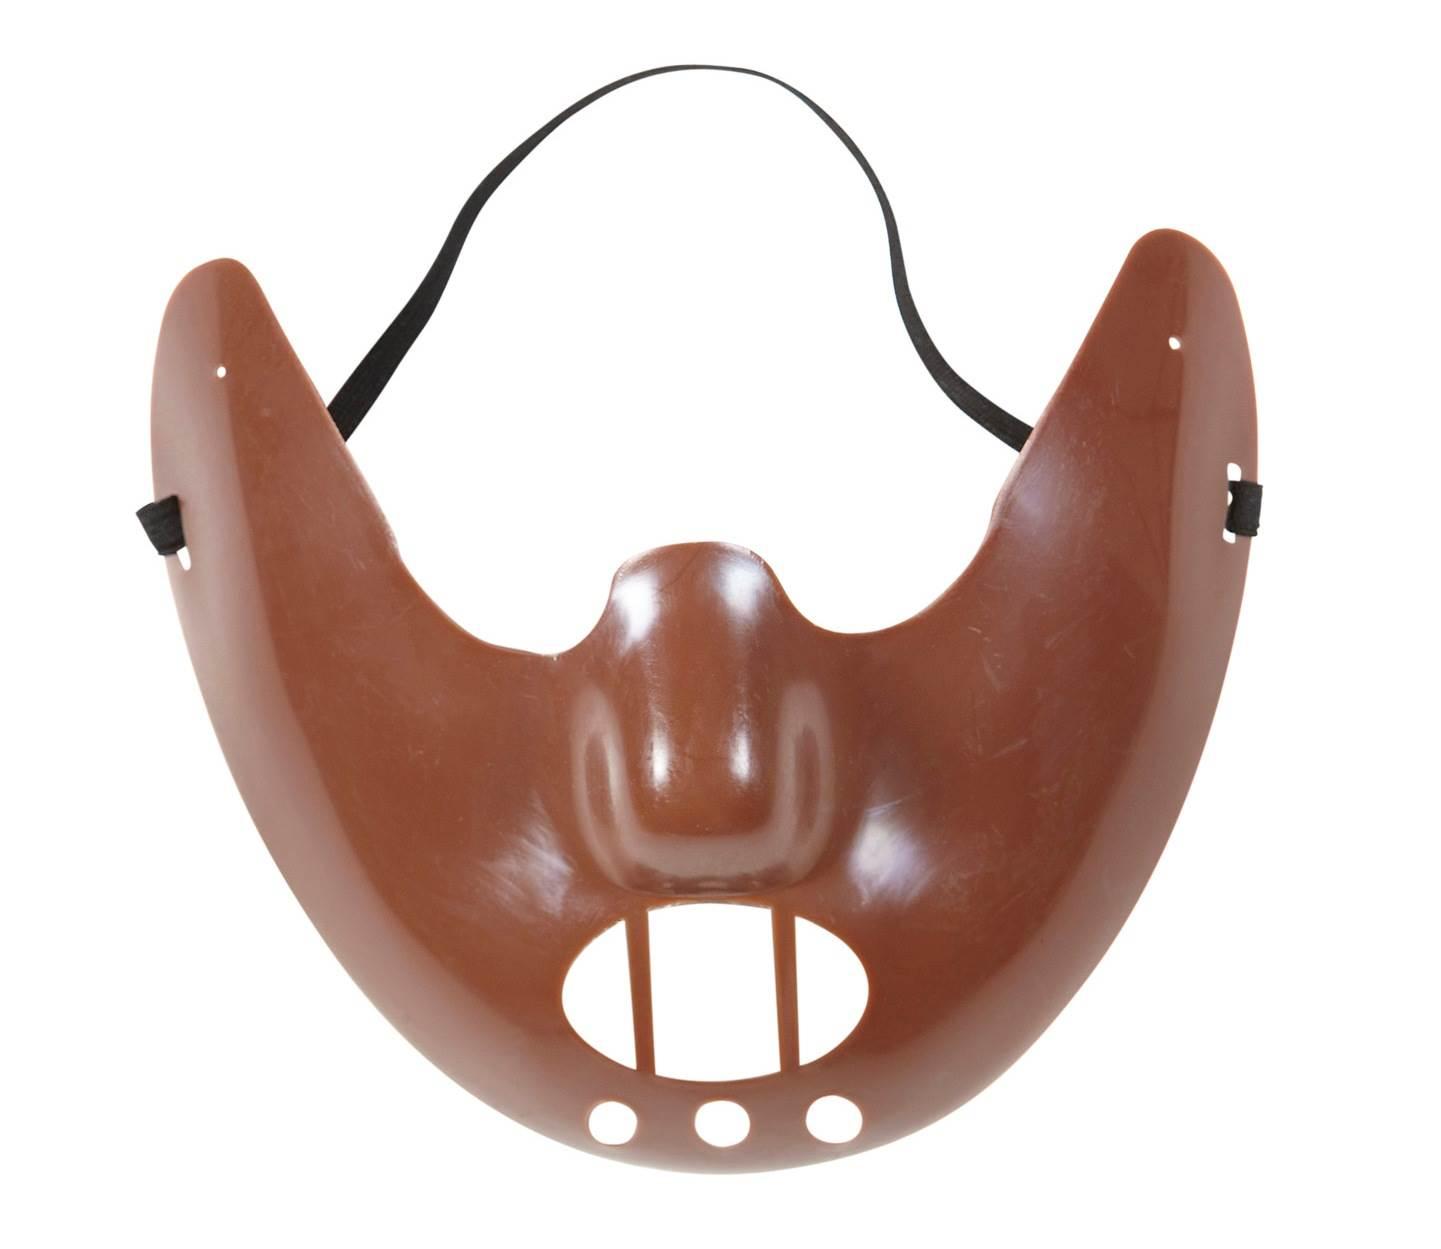 Hannibal masker plastic